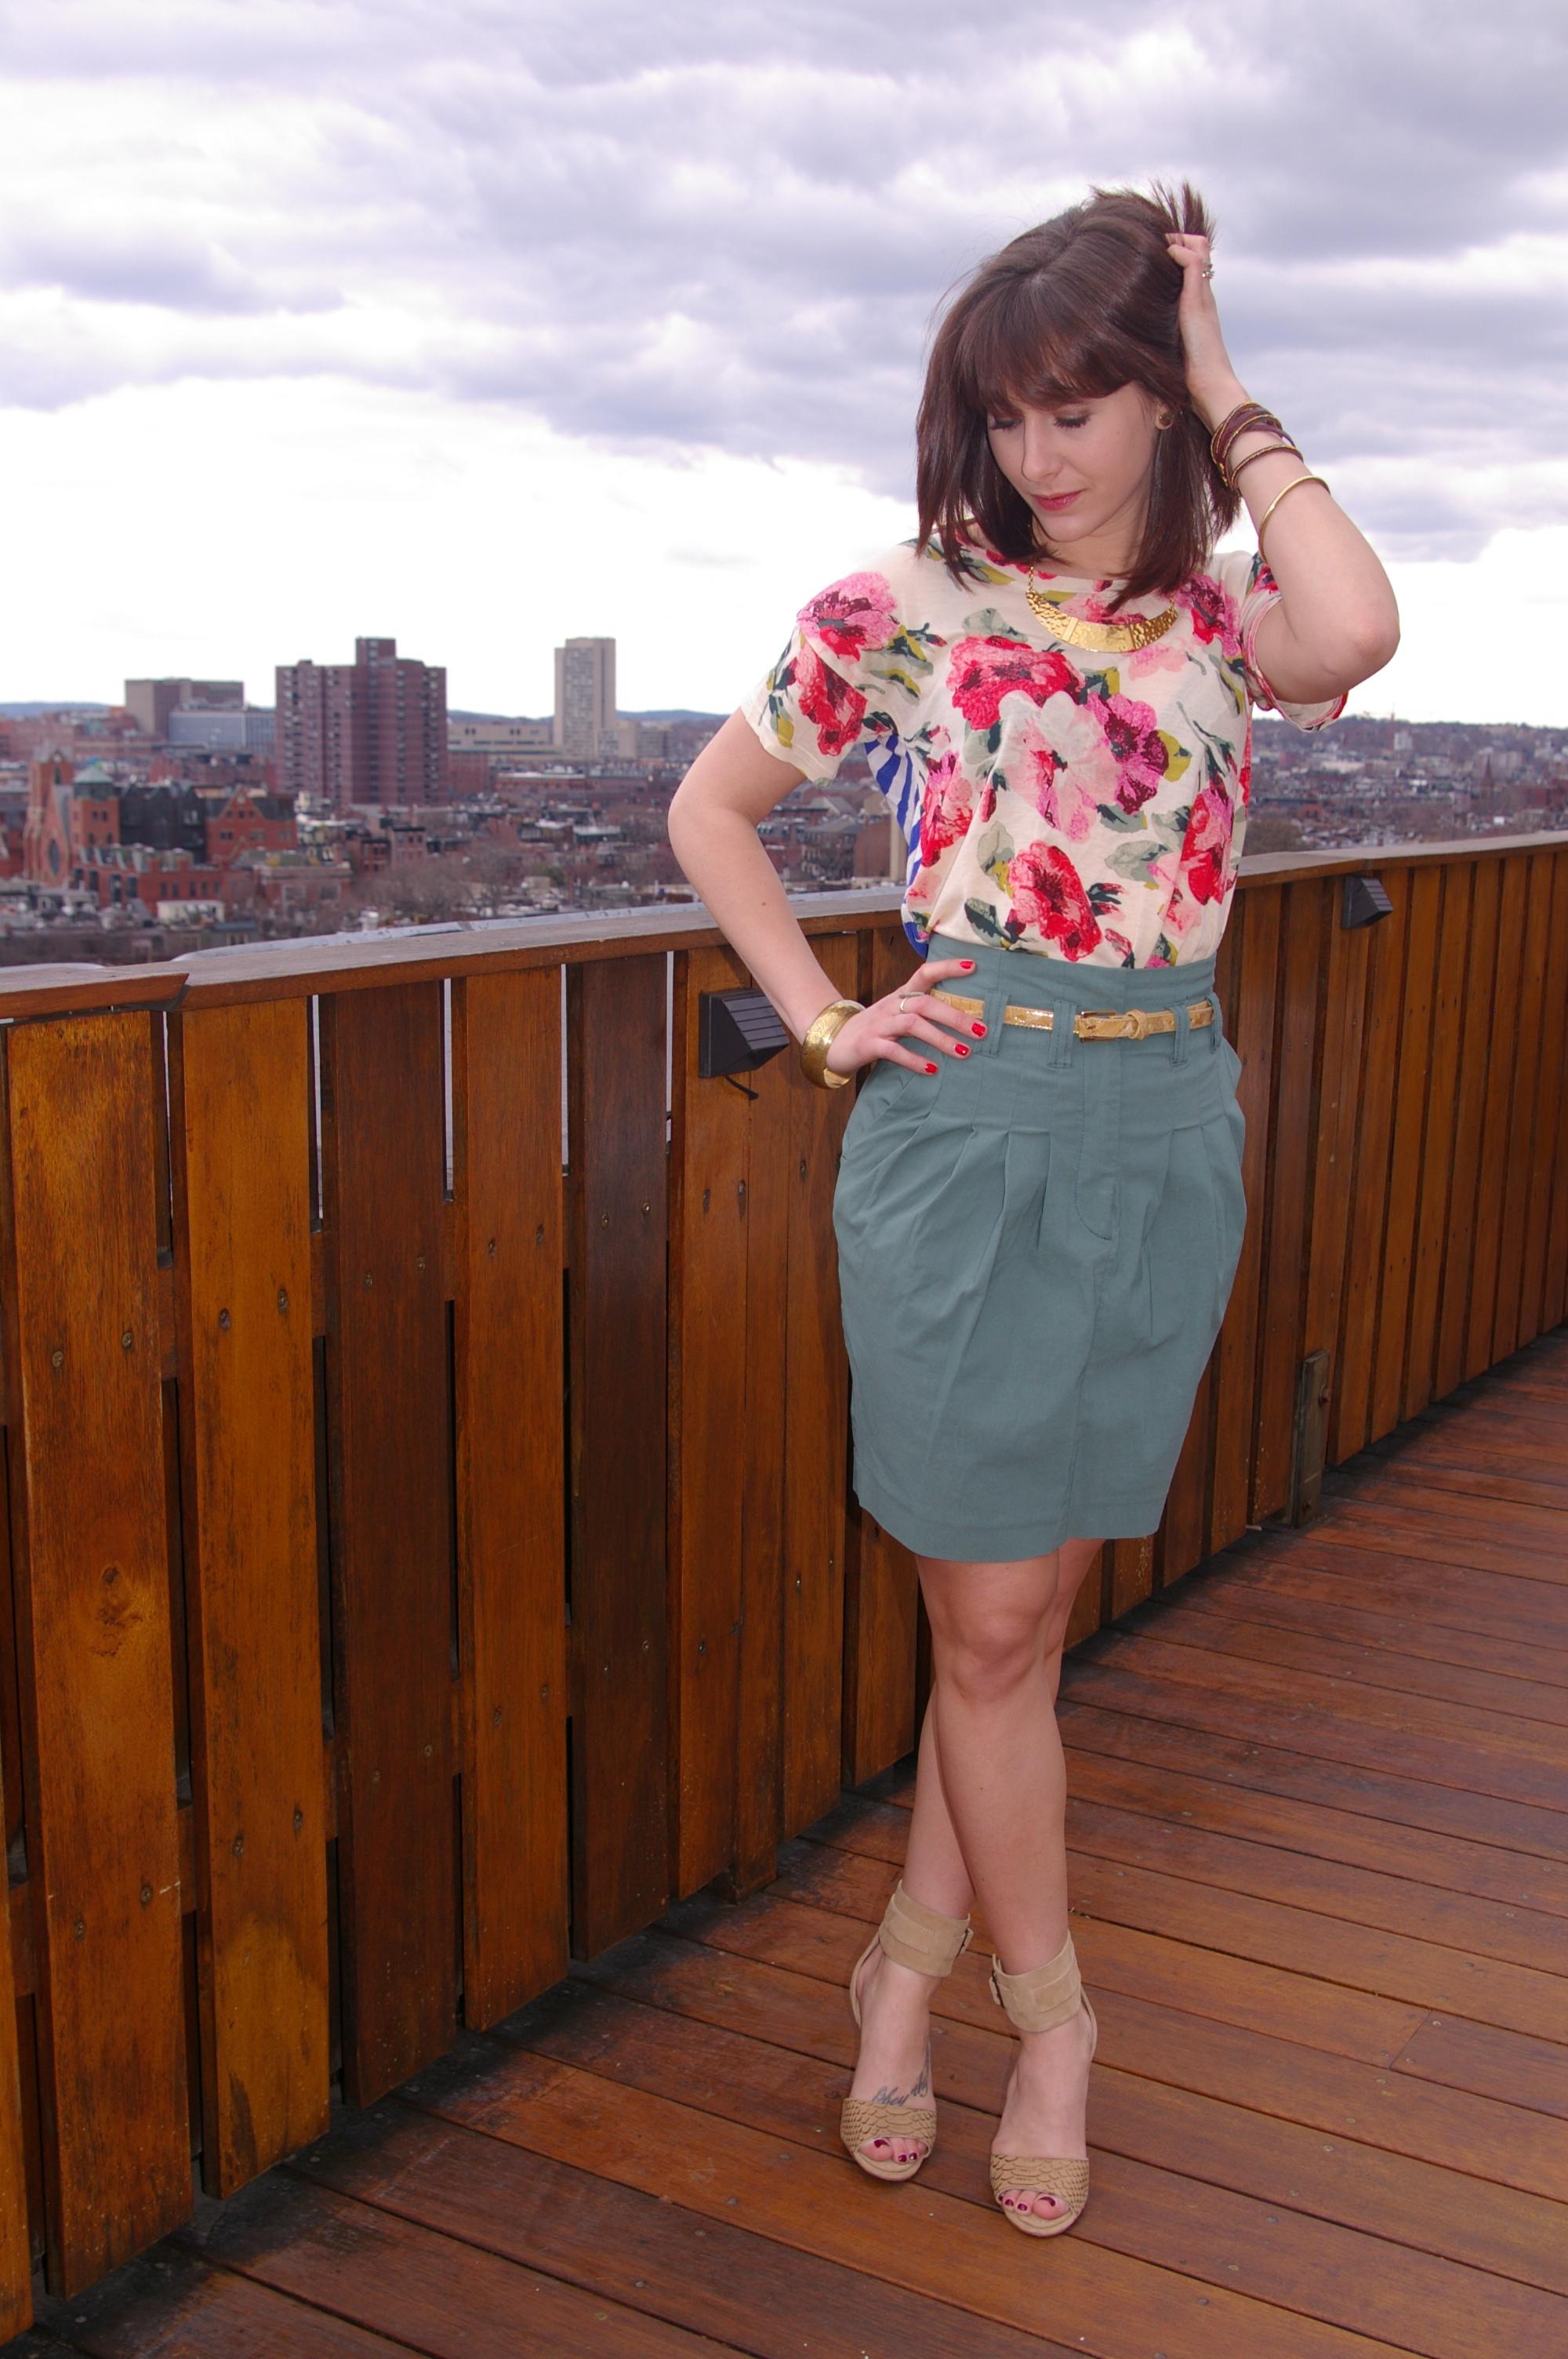 Madewell Tee, H&M skirt, Steve Madden heels